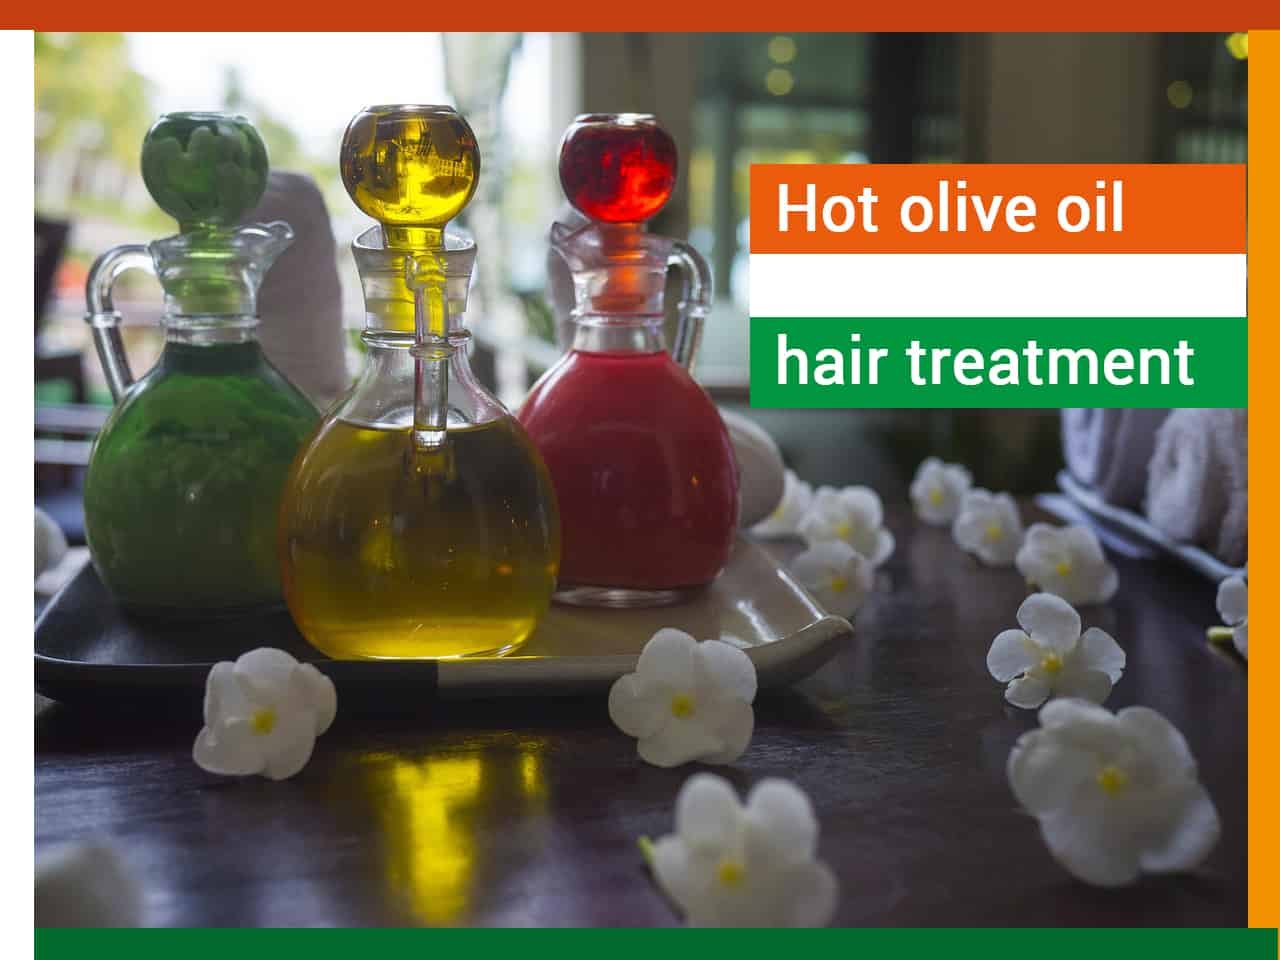 Hot olive oil hair treatment